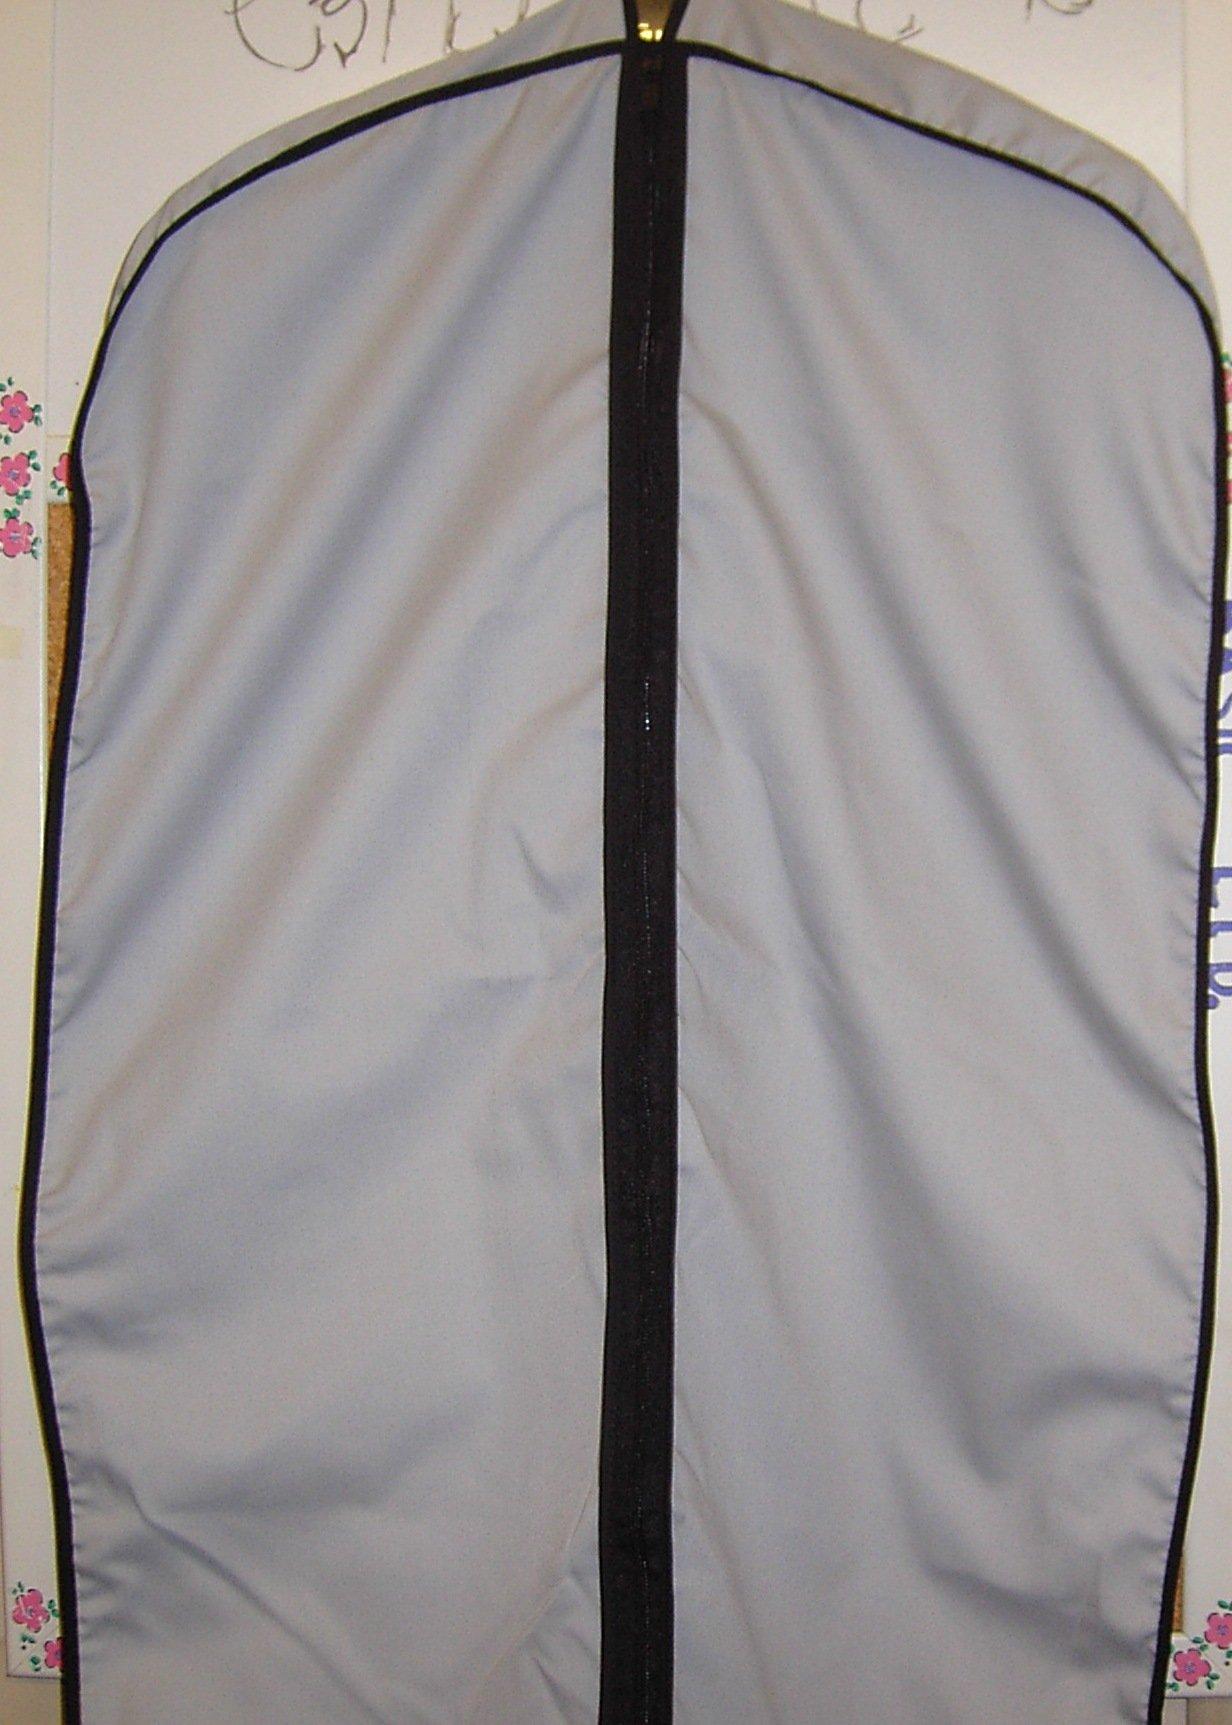 Tuva Breathable Cotton Cloth Fur Coat & Suit/dress Garment Bag, 60'', Grey, Tuva Inc.